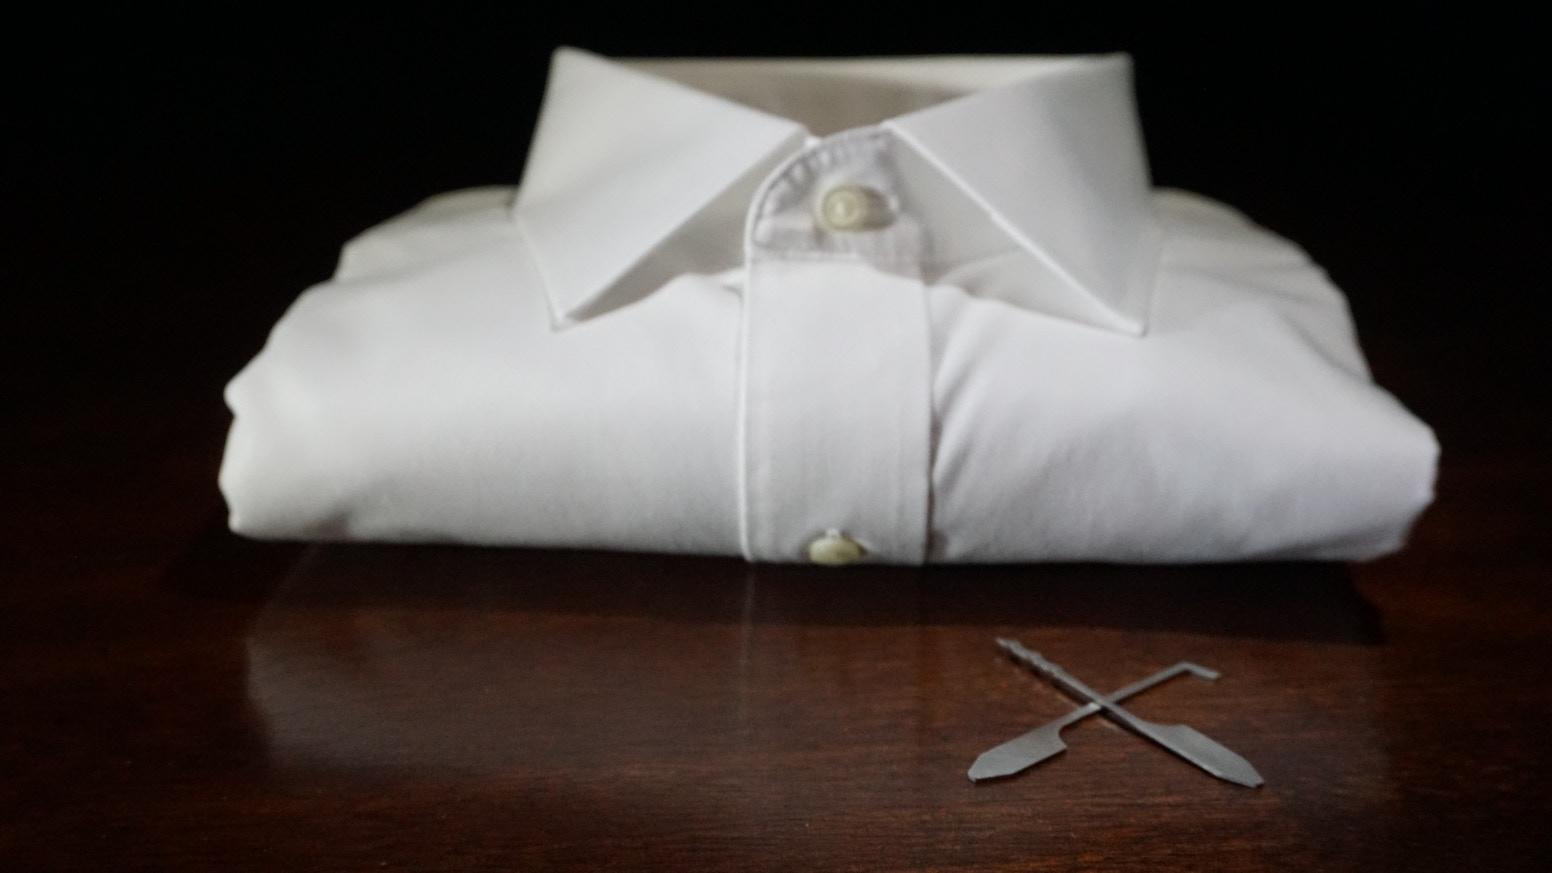 Rakish Lock Pick Collar Stays By Rakish Collar Stays Kickstarter